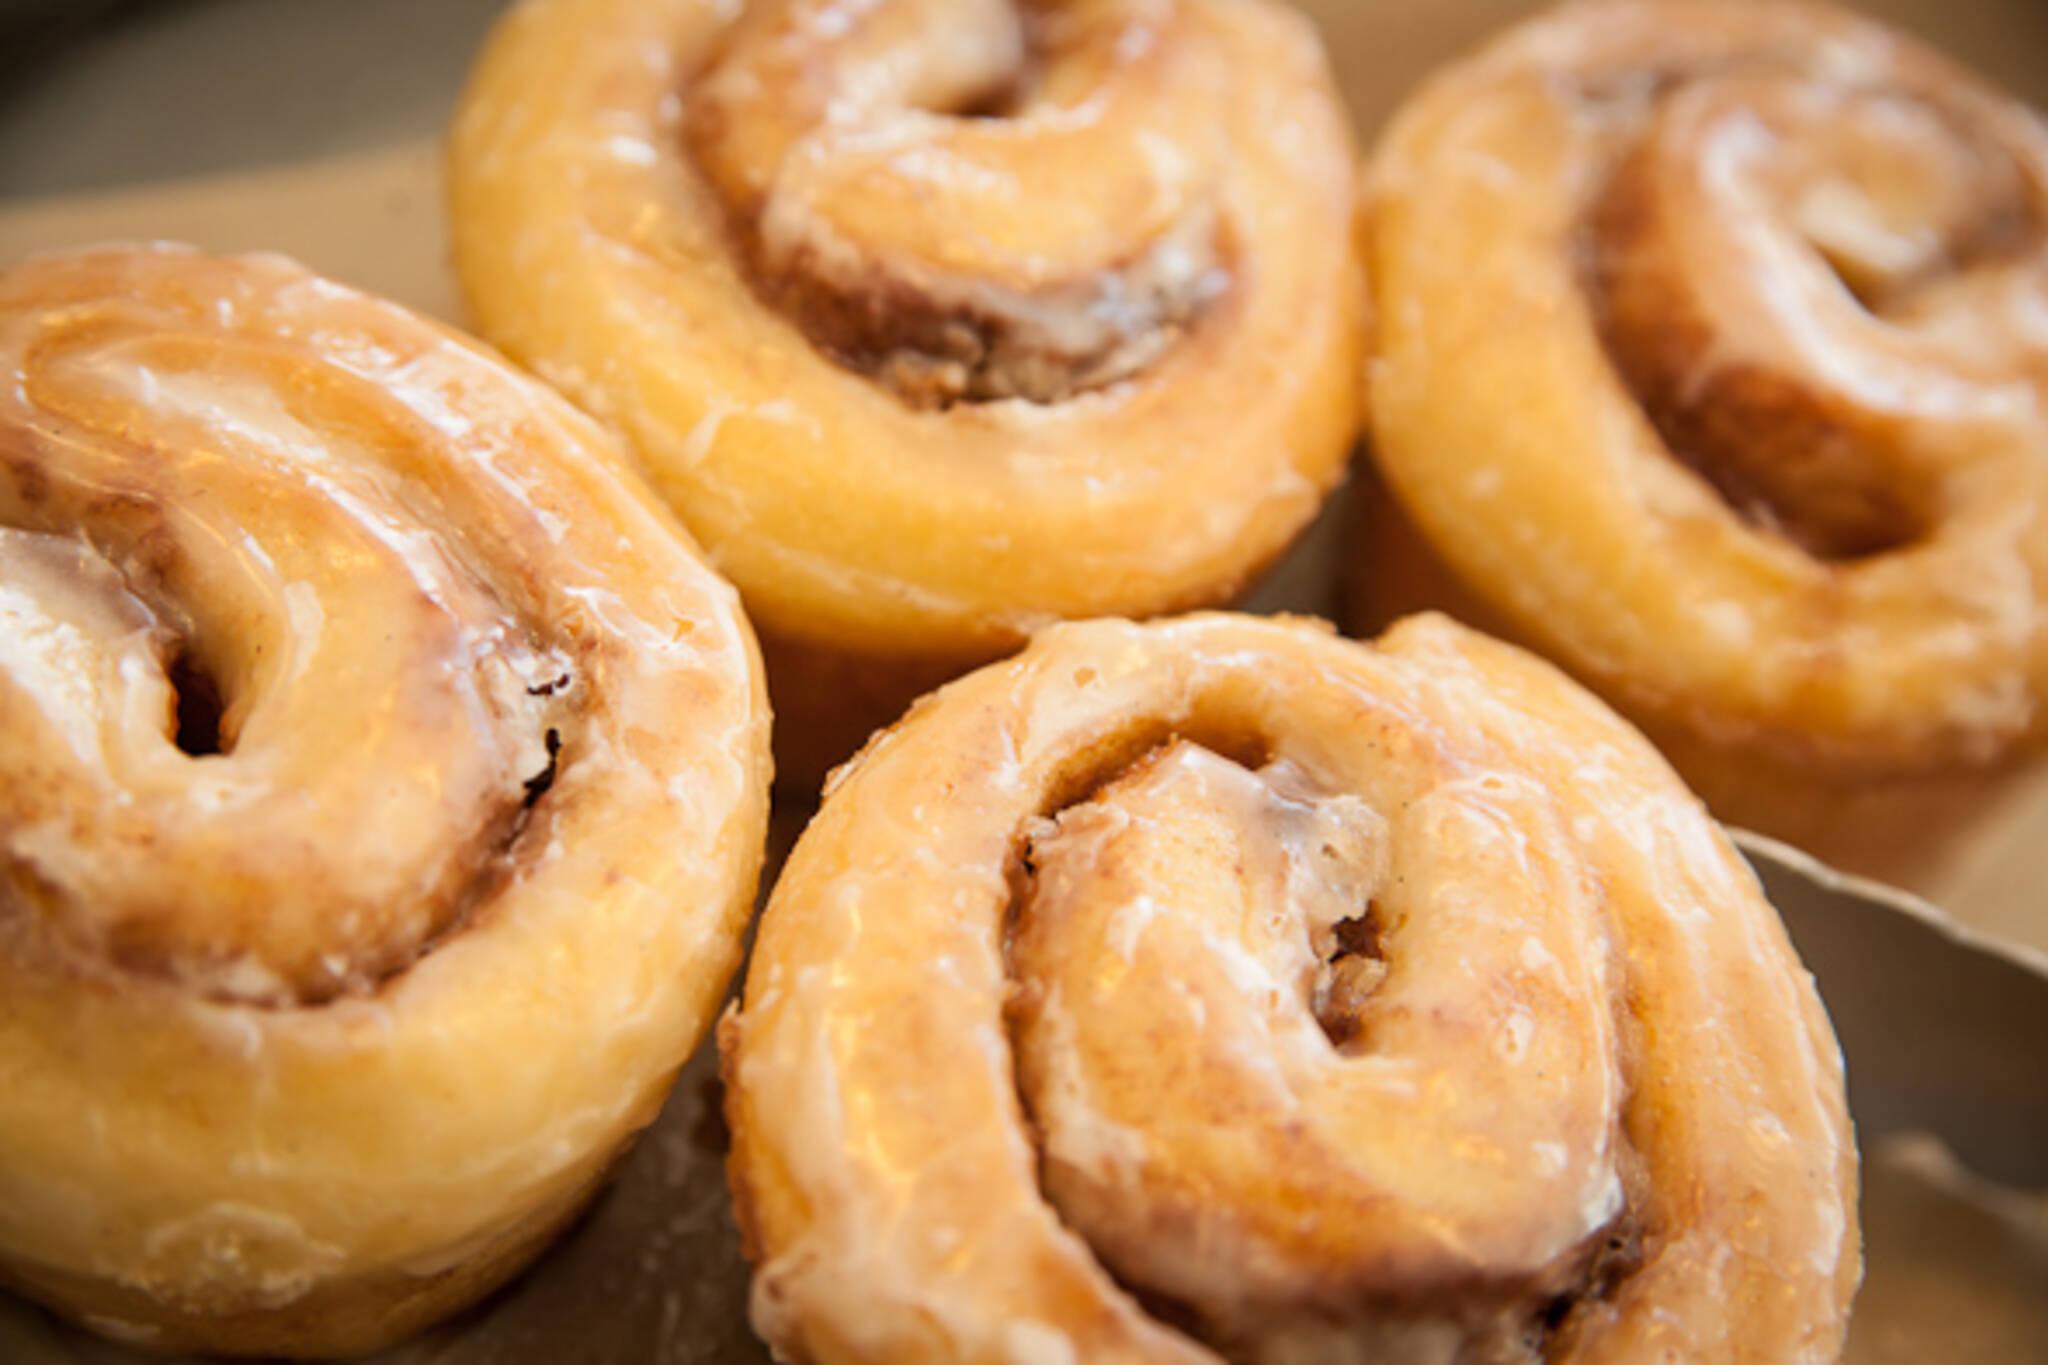 new bakery toronto